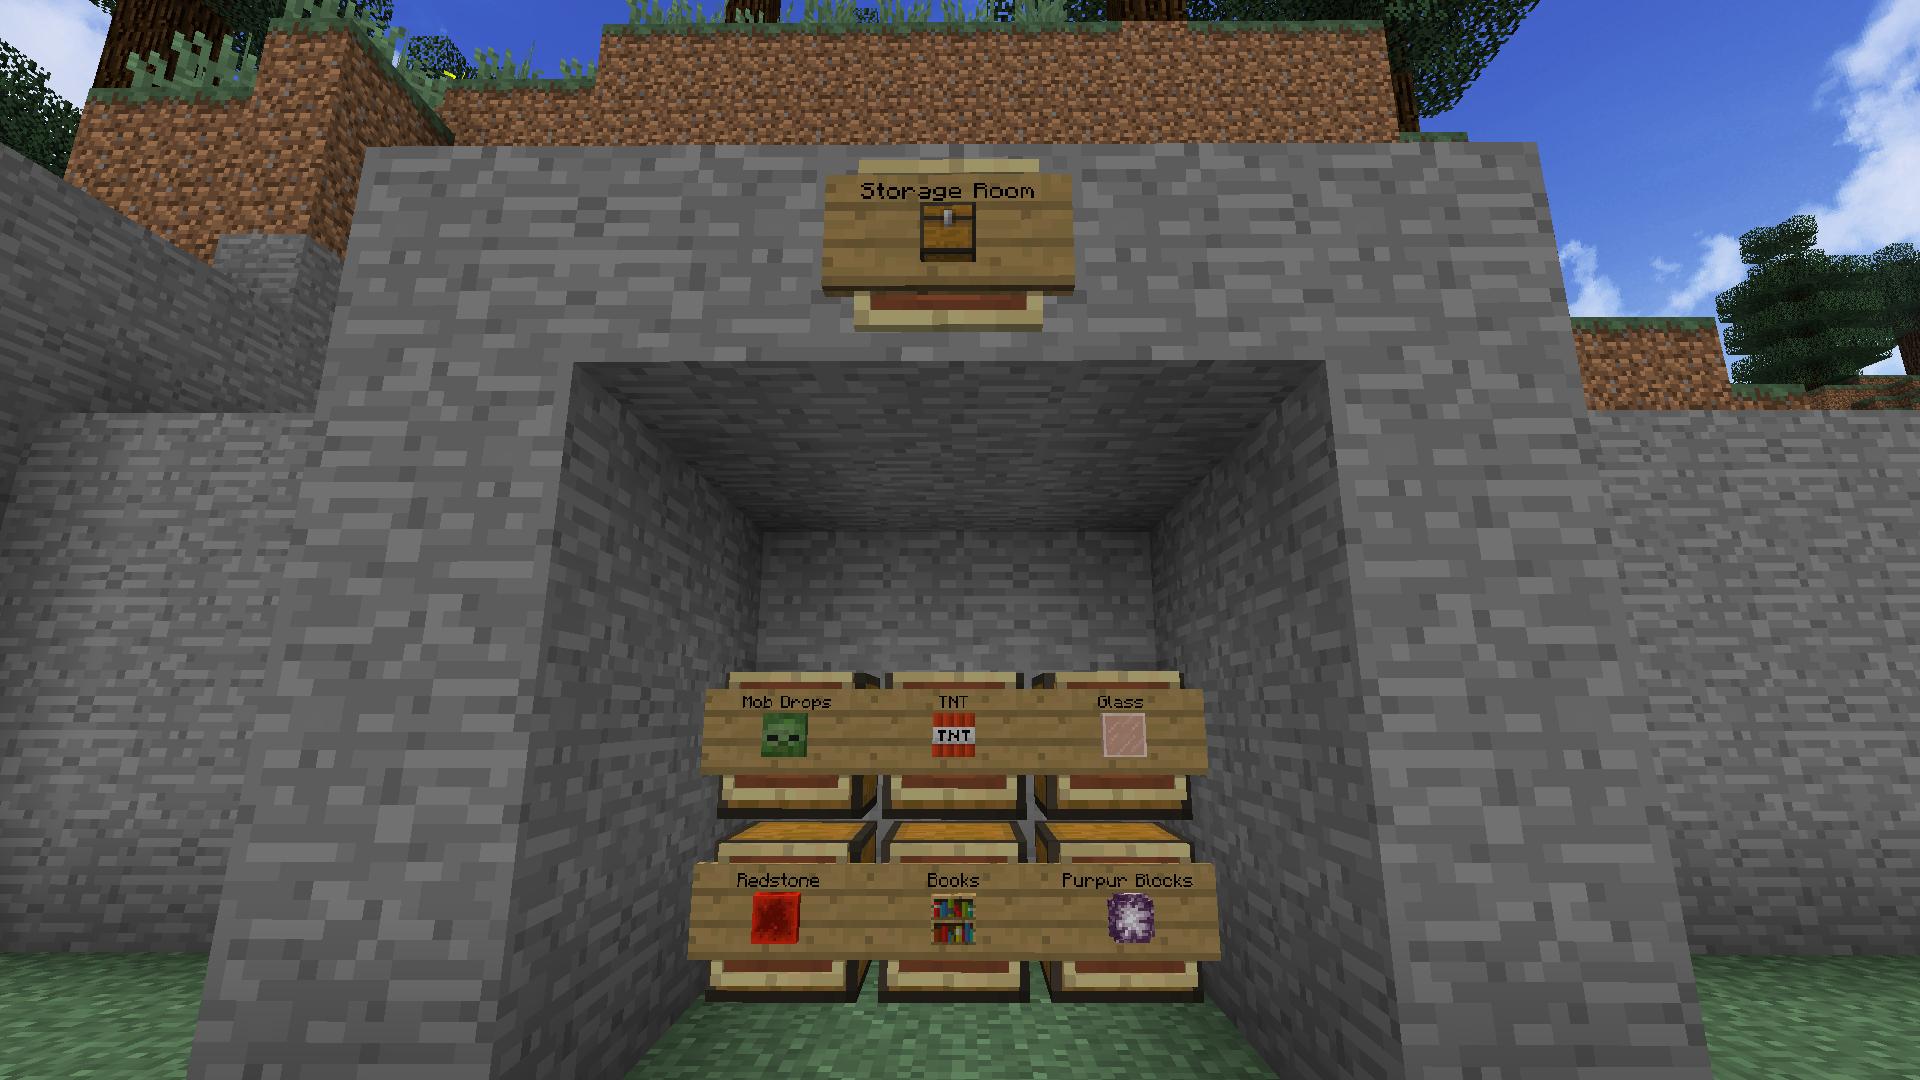 Item frames and signs in Minecraft - Reddit. | Minecraft ...